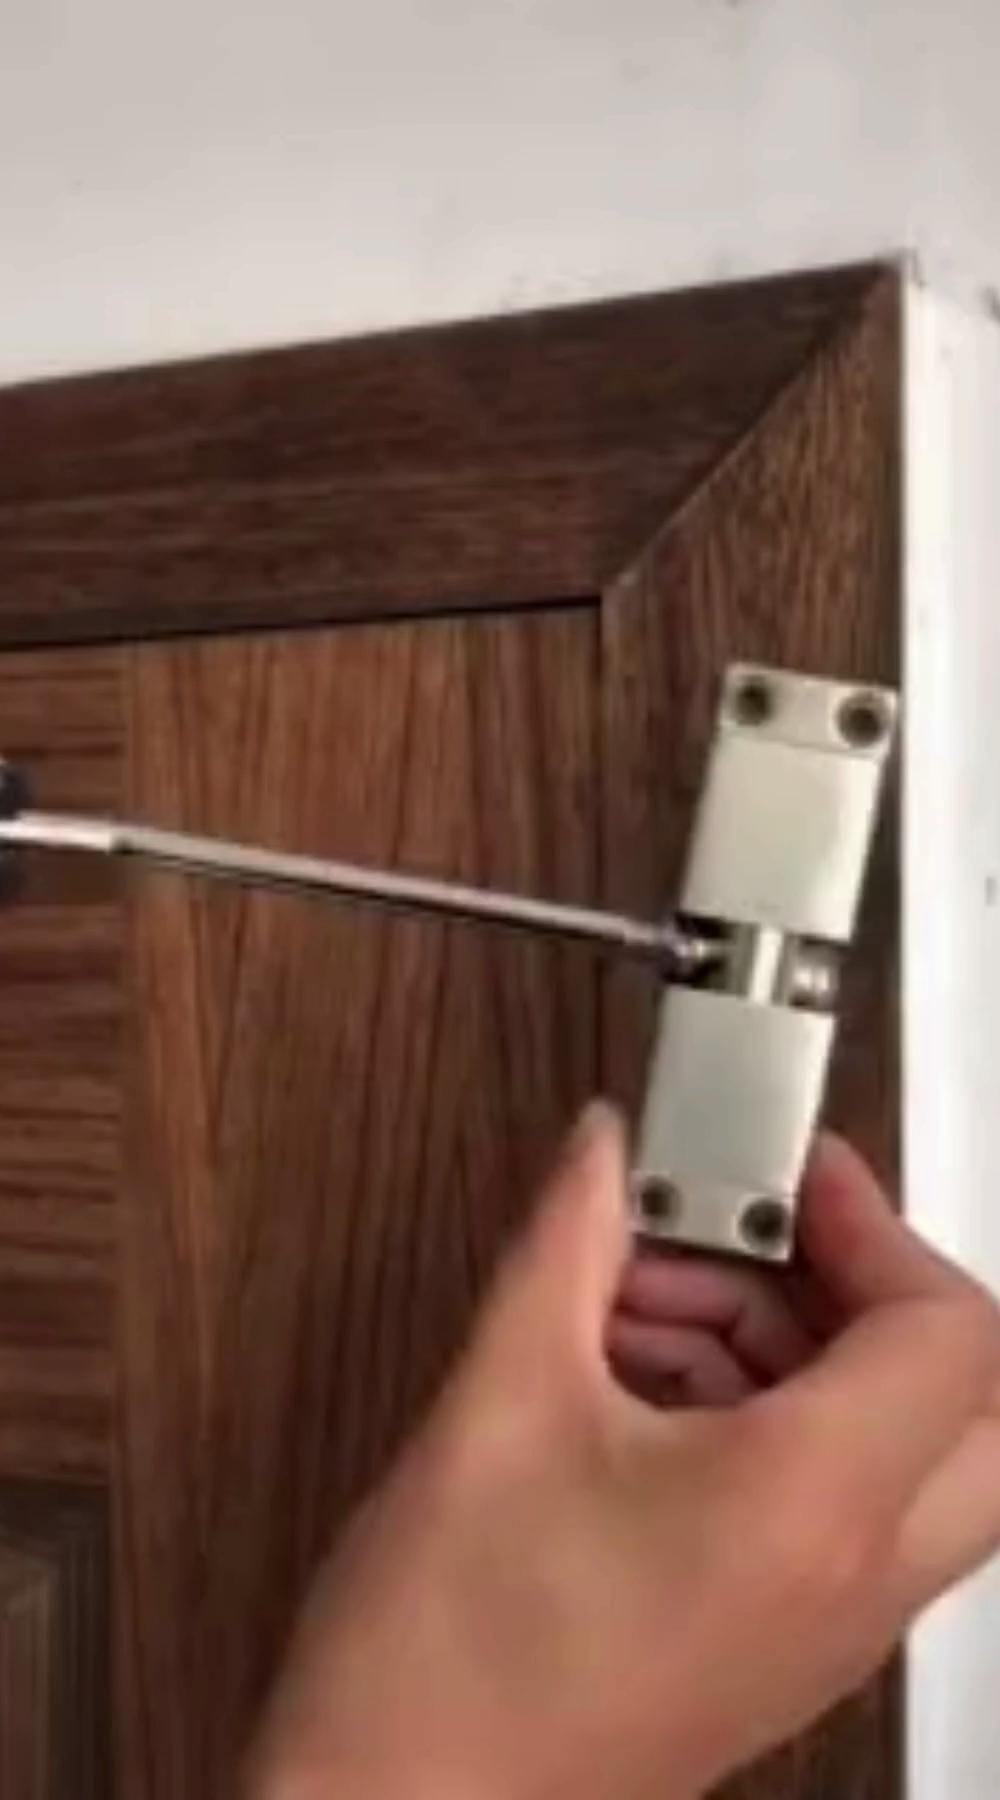 Auto Mounted Spring Door Closer Stainless Steel Adjust Surface Self Closing Door Video Video In 2020 Diy Projects Plans Diy Home Repair Home Room Design